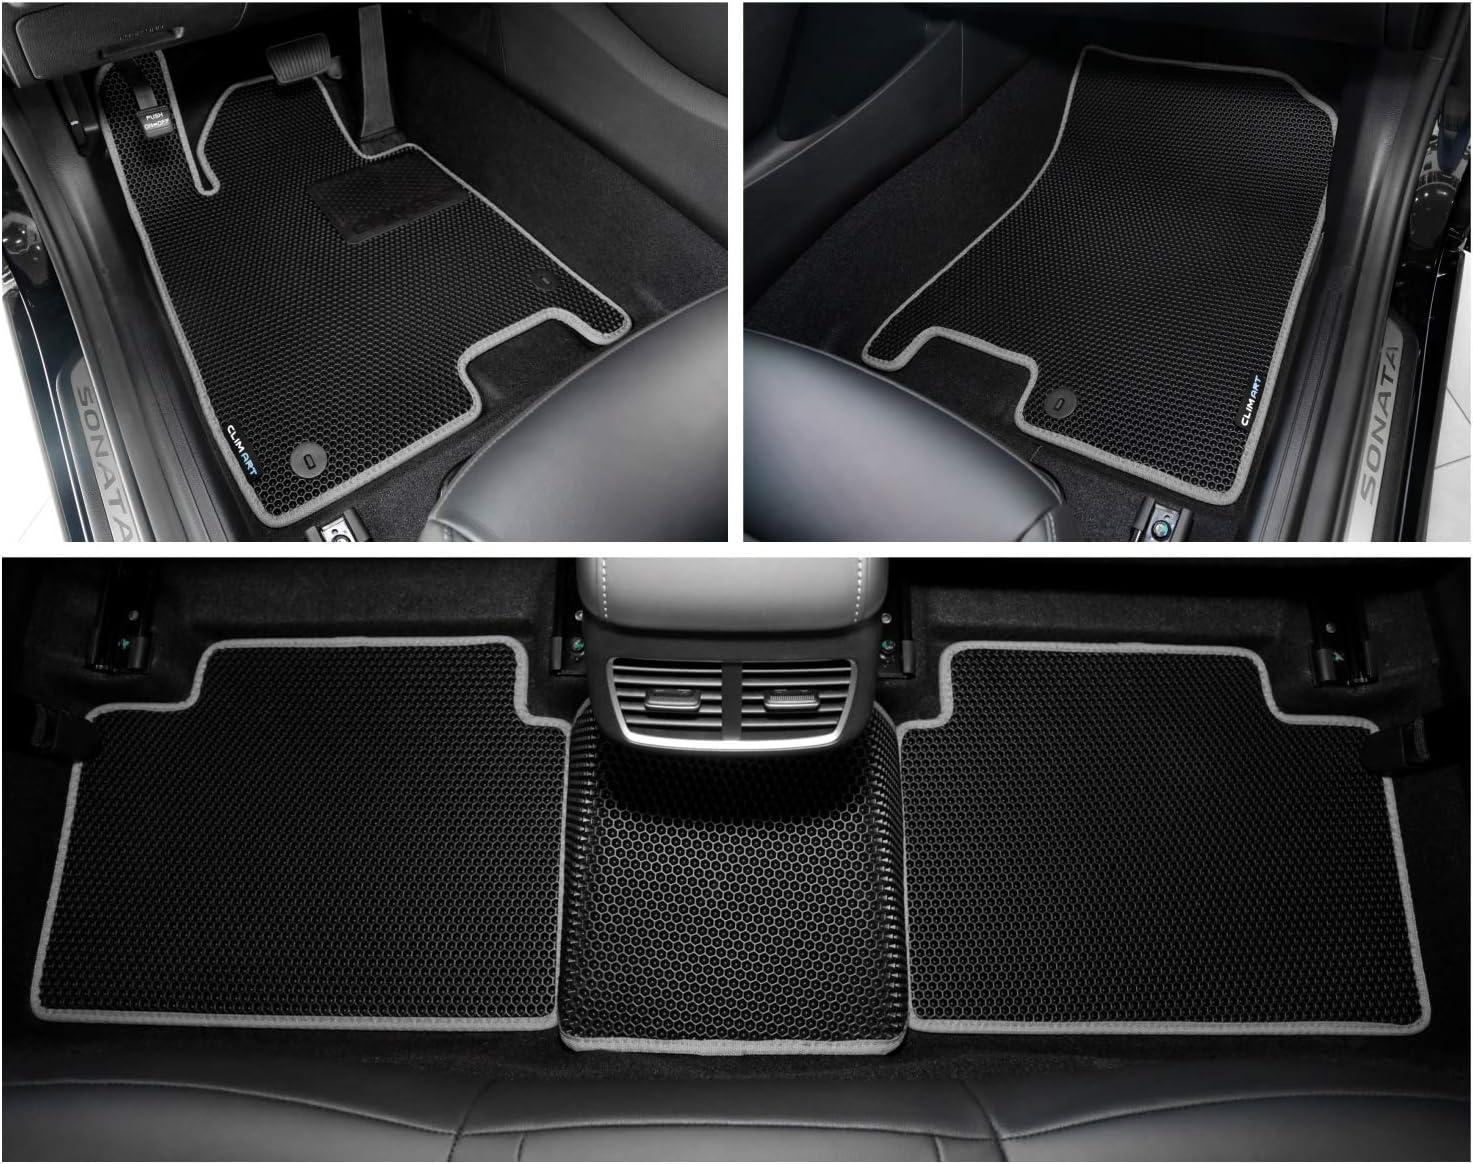 1st /& 2nd Row Car Accessories for Man /& Woman Car Mats Floor Liner Tapetes para Autos All-Weather Black//Black CLIM ART Honeycomb Custom Fit Floor Mats for Hyundai Sonata 2020 FL011520039